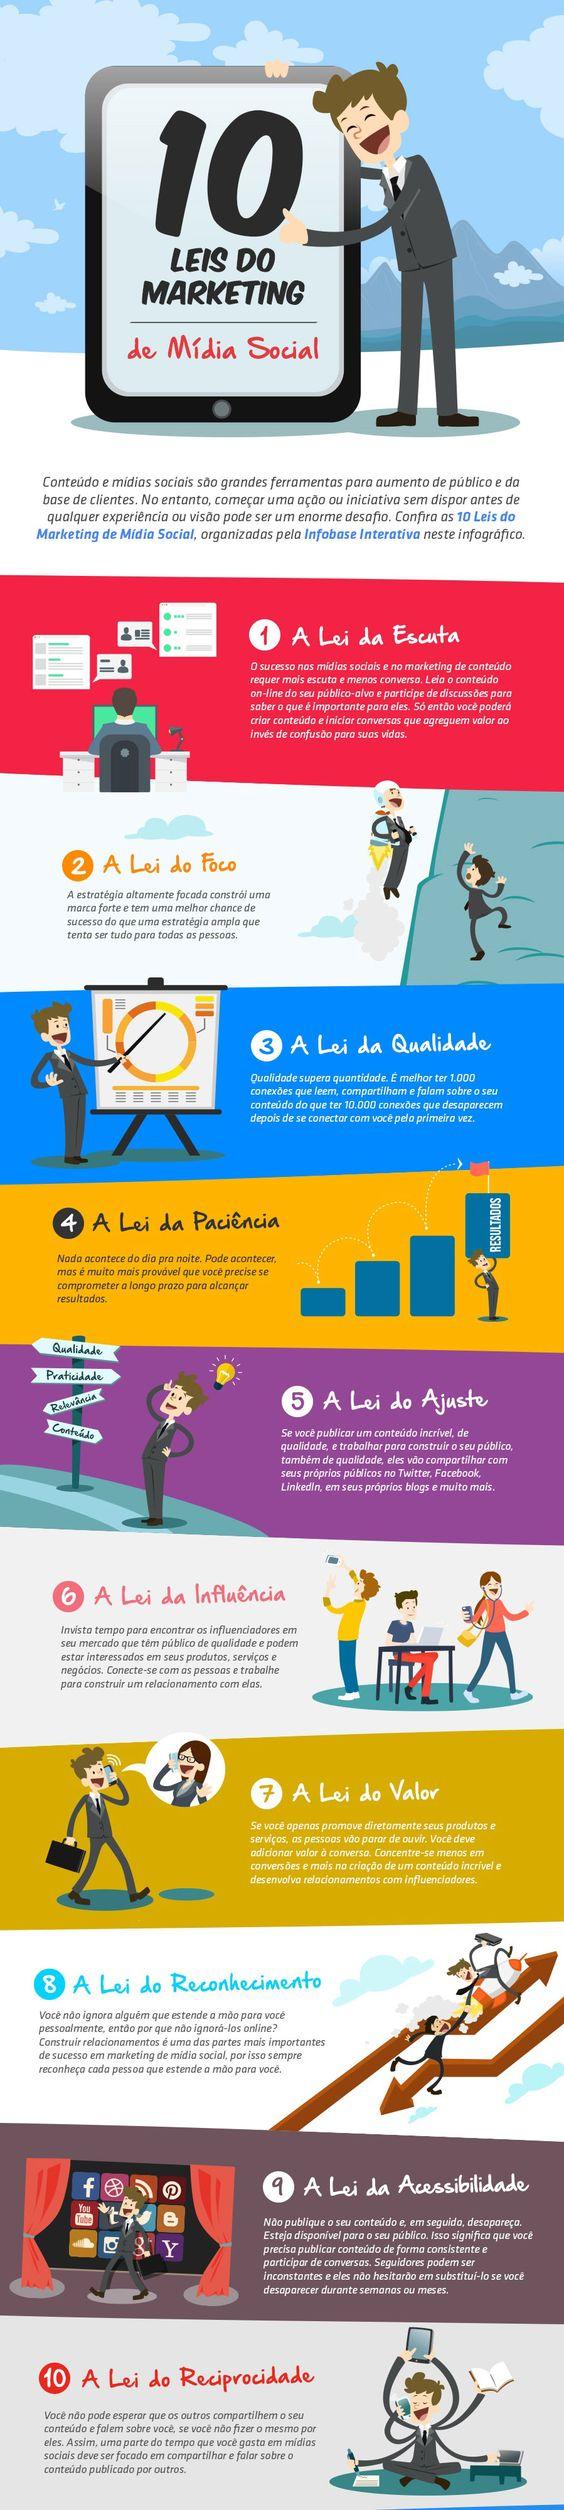 Infográfico: as 10 Leis do Marketing de Mídia Social